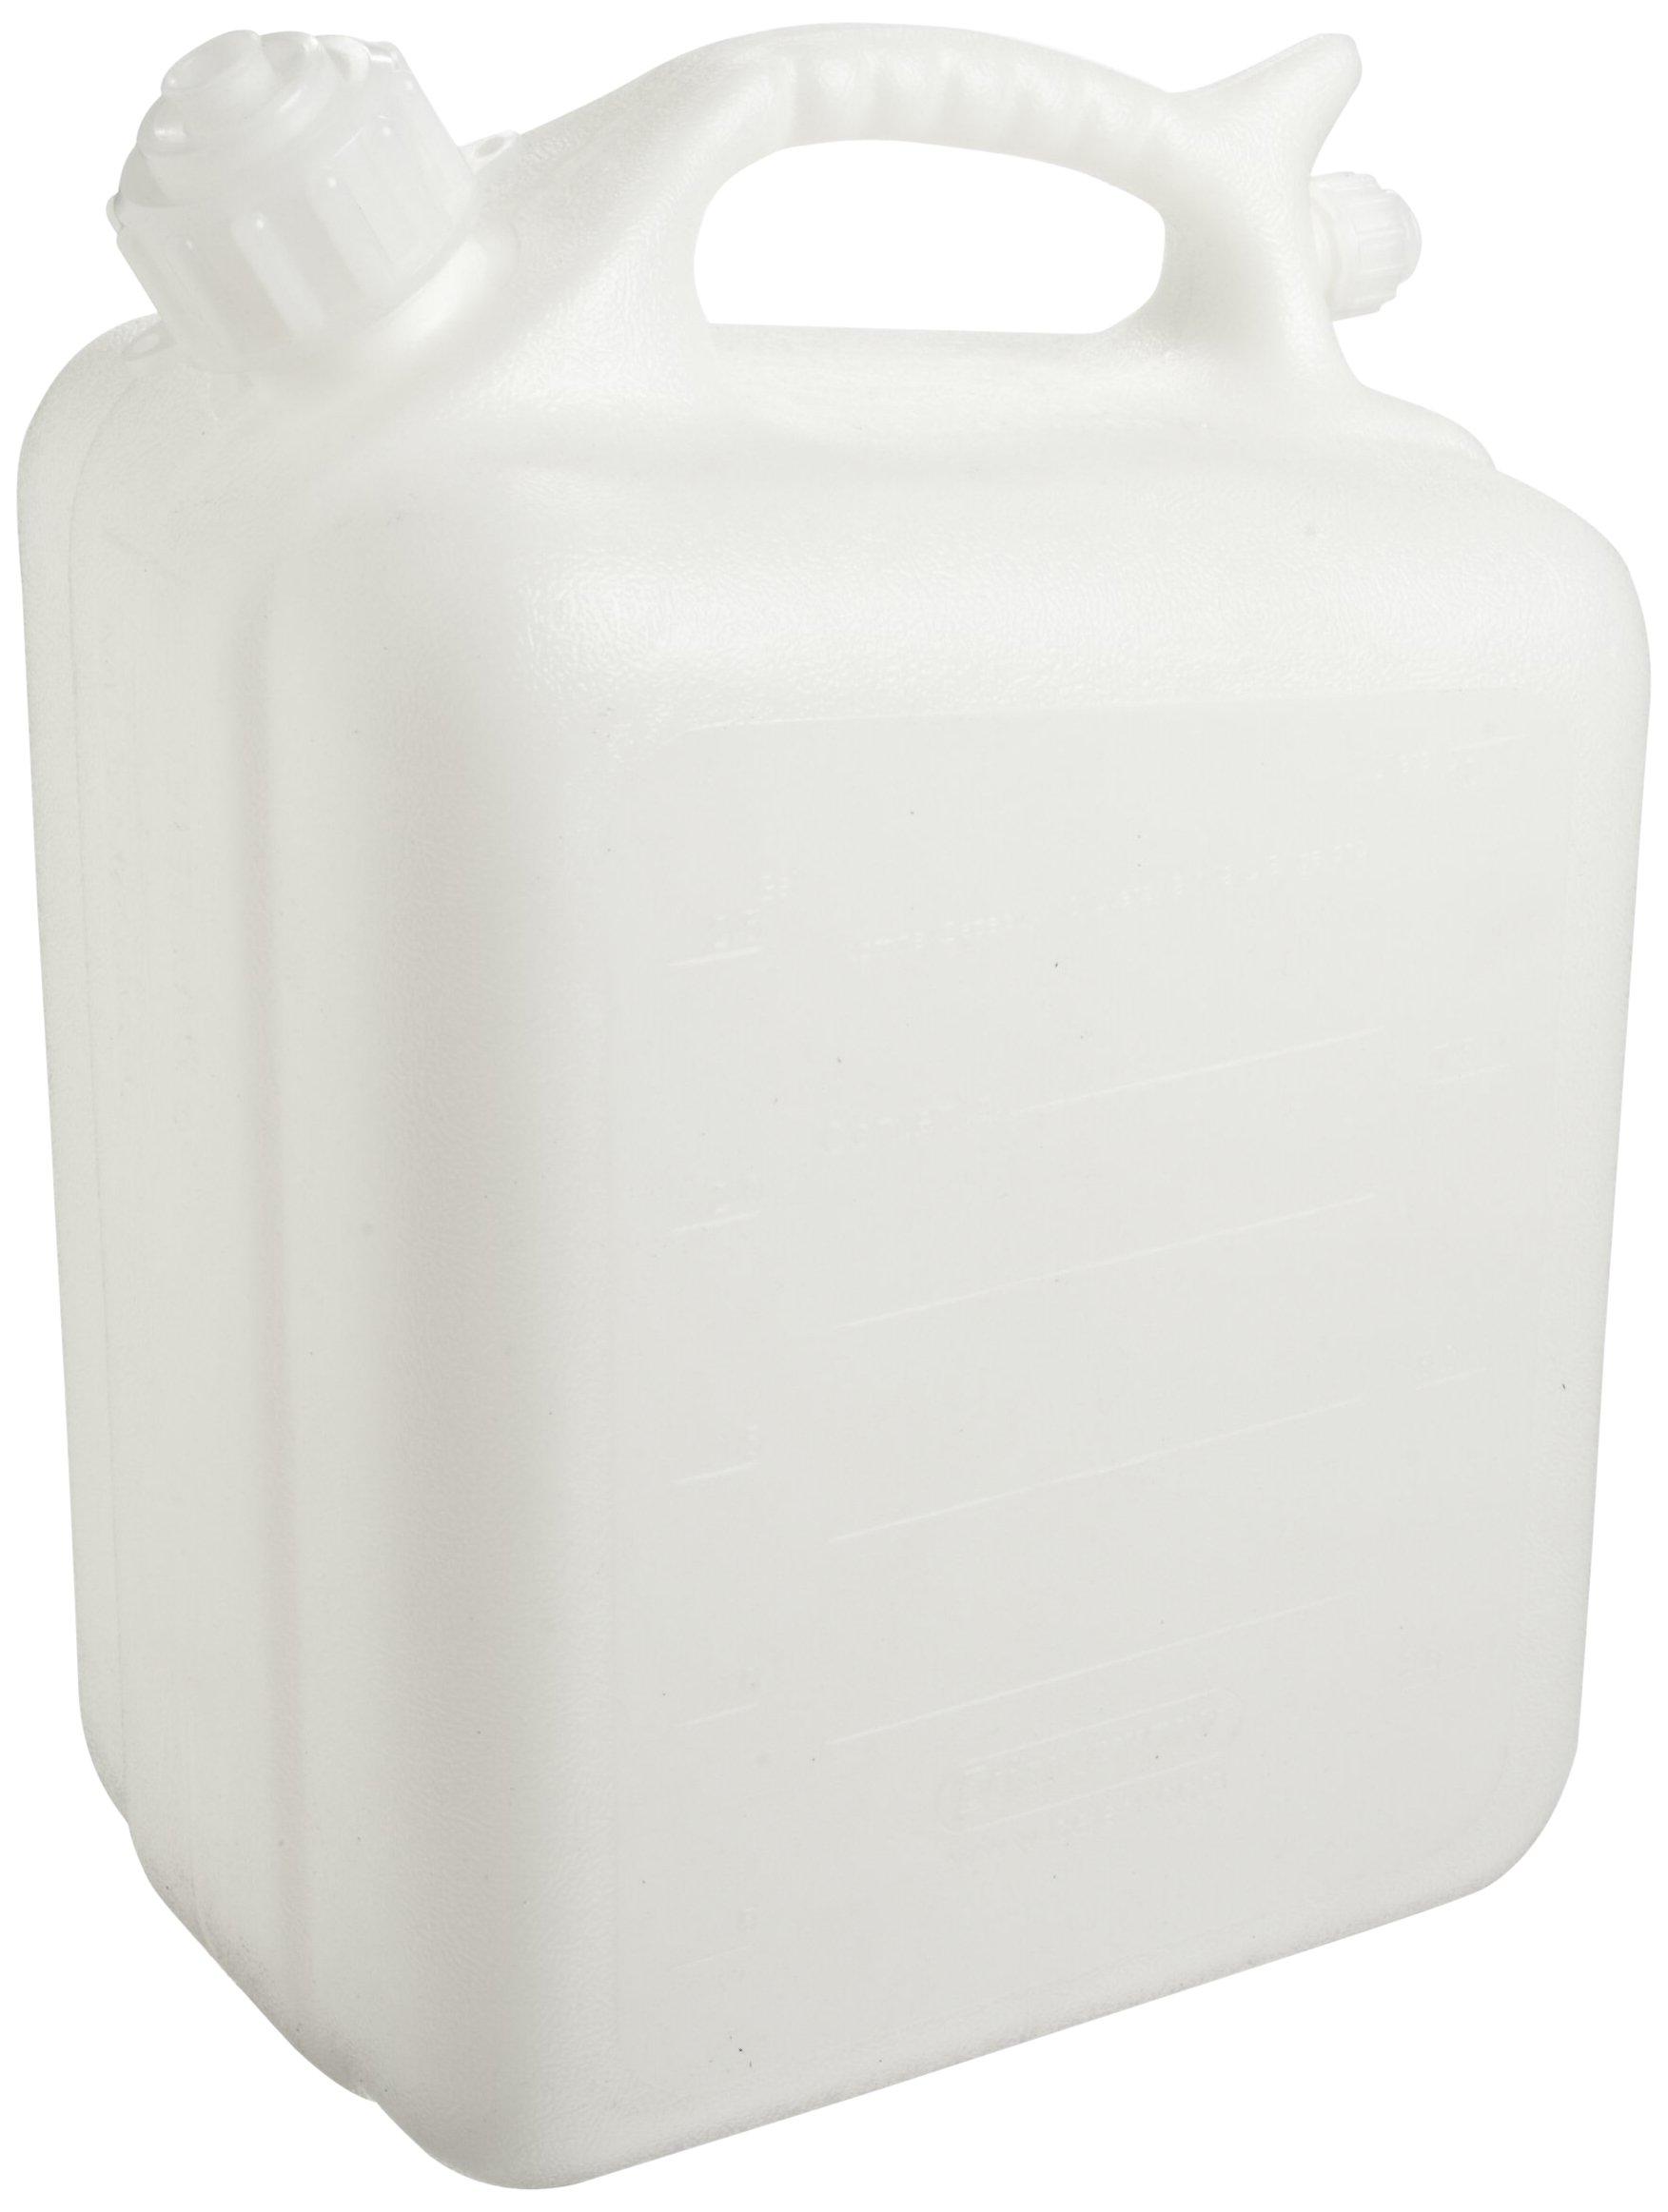 Bel-Art Polyethylene Jerrican; 5 Liters (1.25 Gallons), Screw Cap, 1 in. I.D. Spout (H10935-0000)